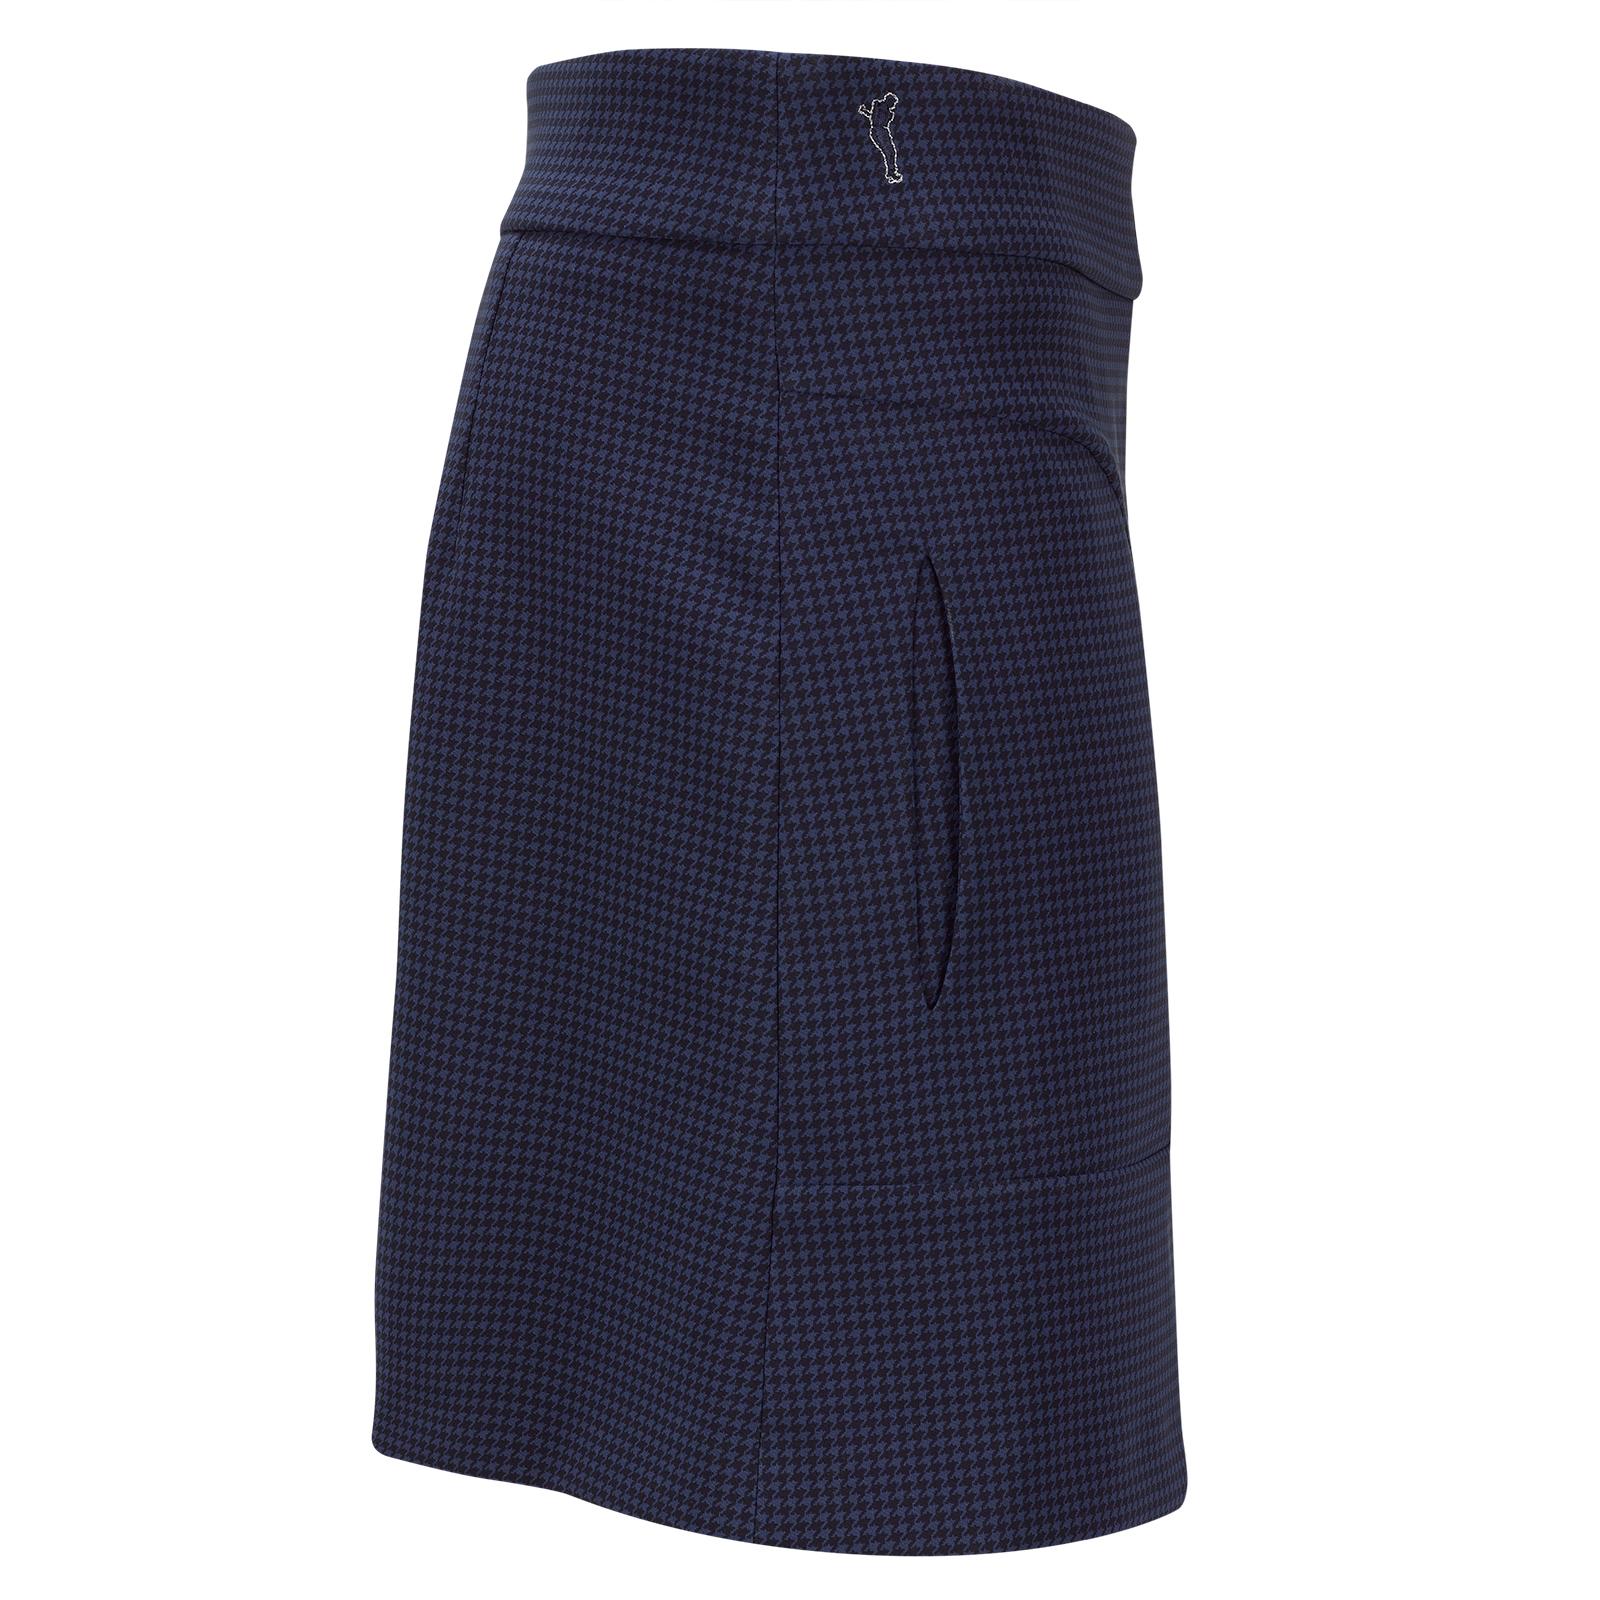 Slim Fit Damen Golfskort aus 4-Way-Stretch Funktionsmaterial mit Print